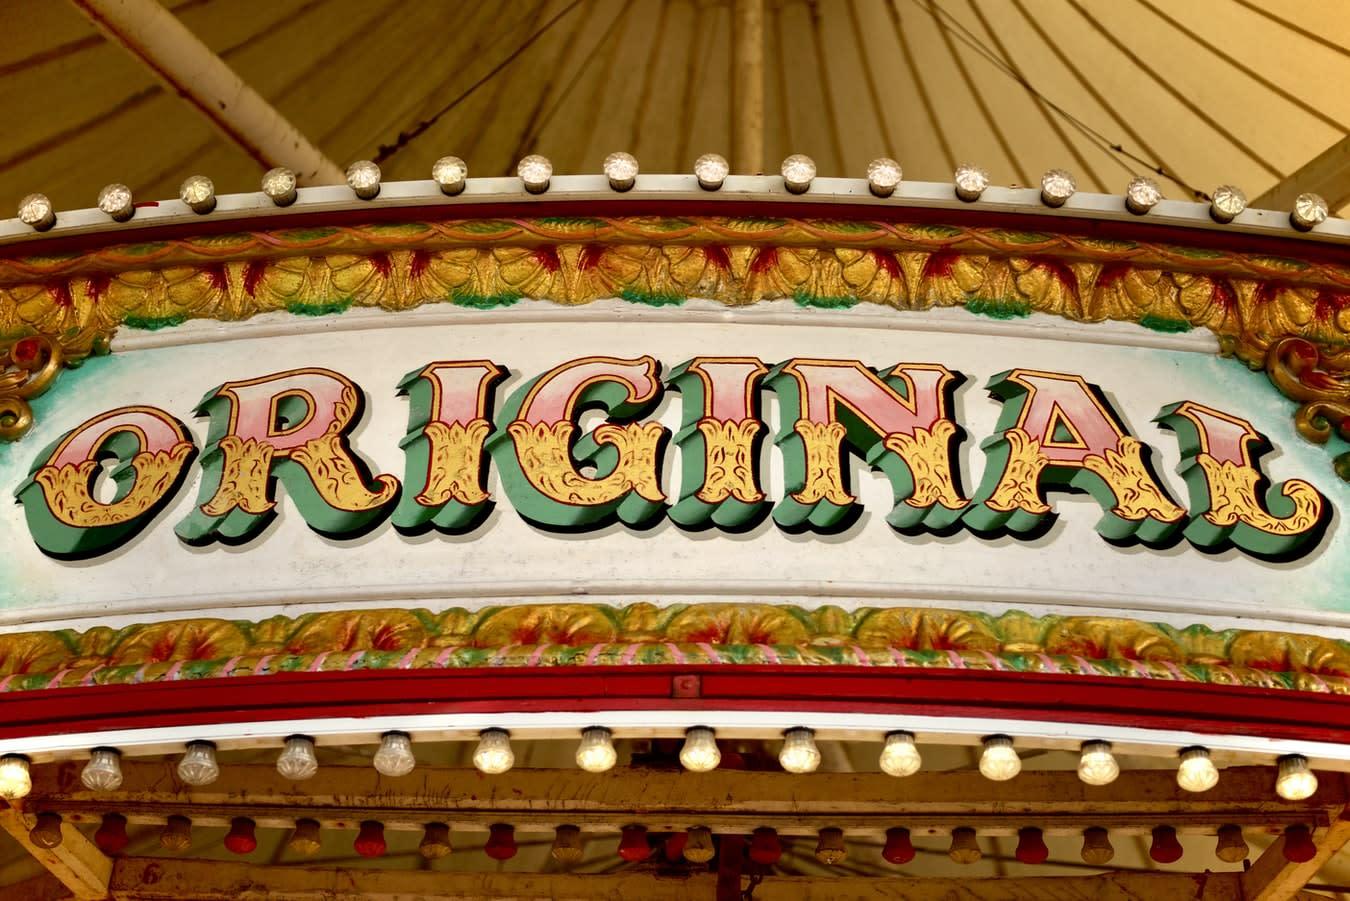 Play'n GO skapar en cirkusupplevelse med 3 Clown Monty